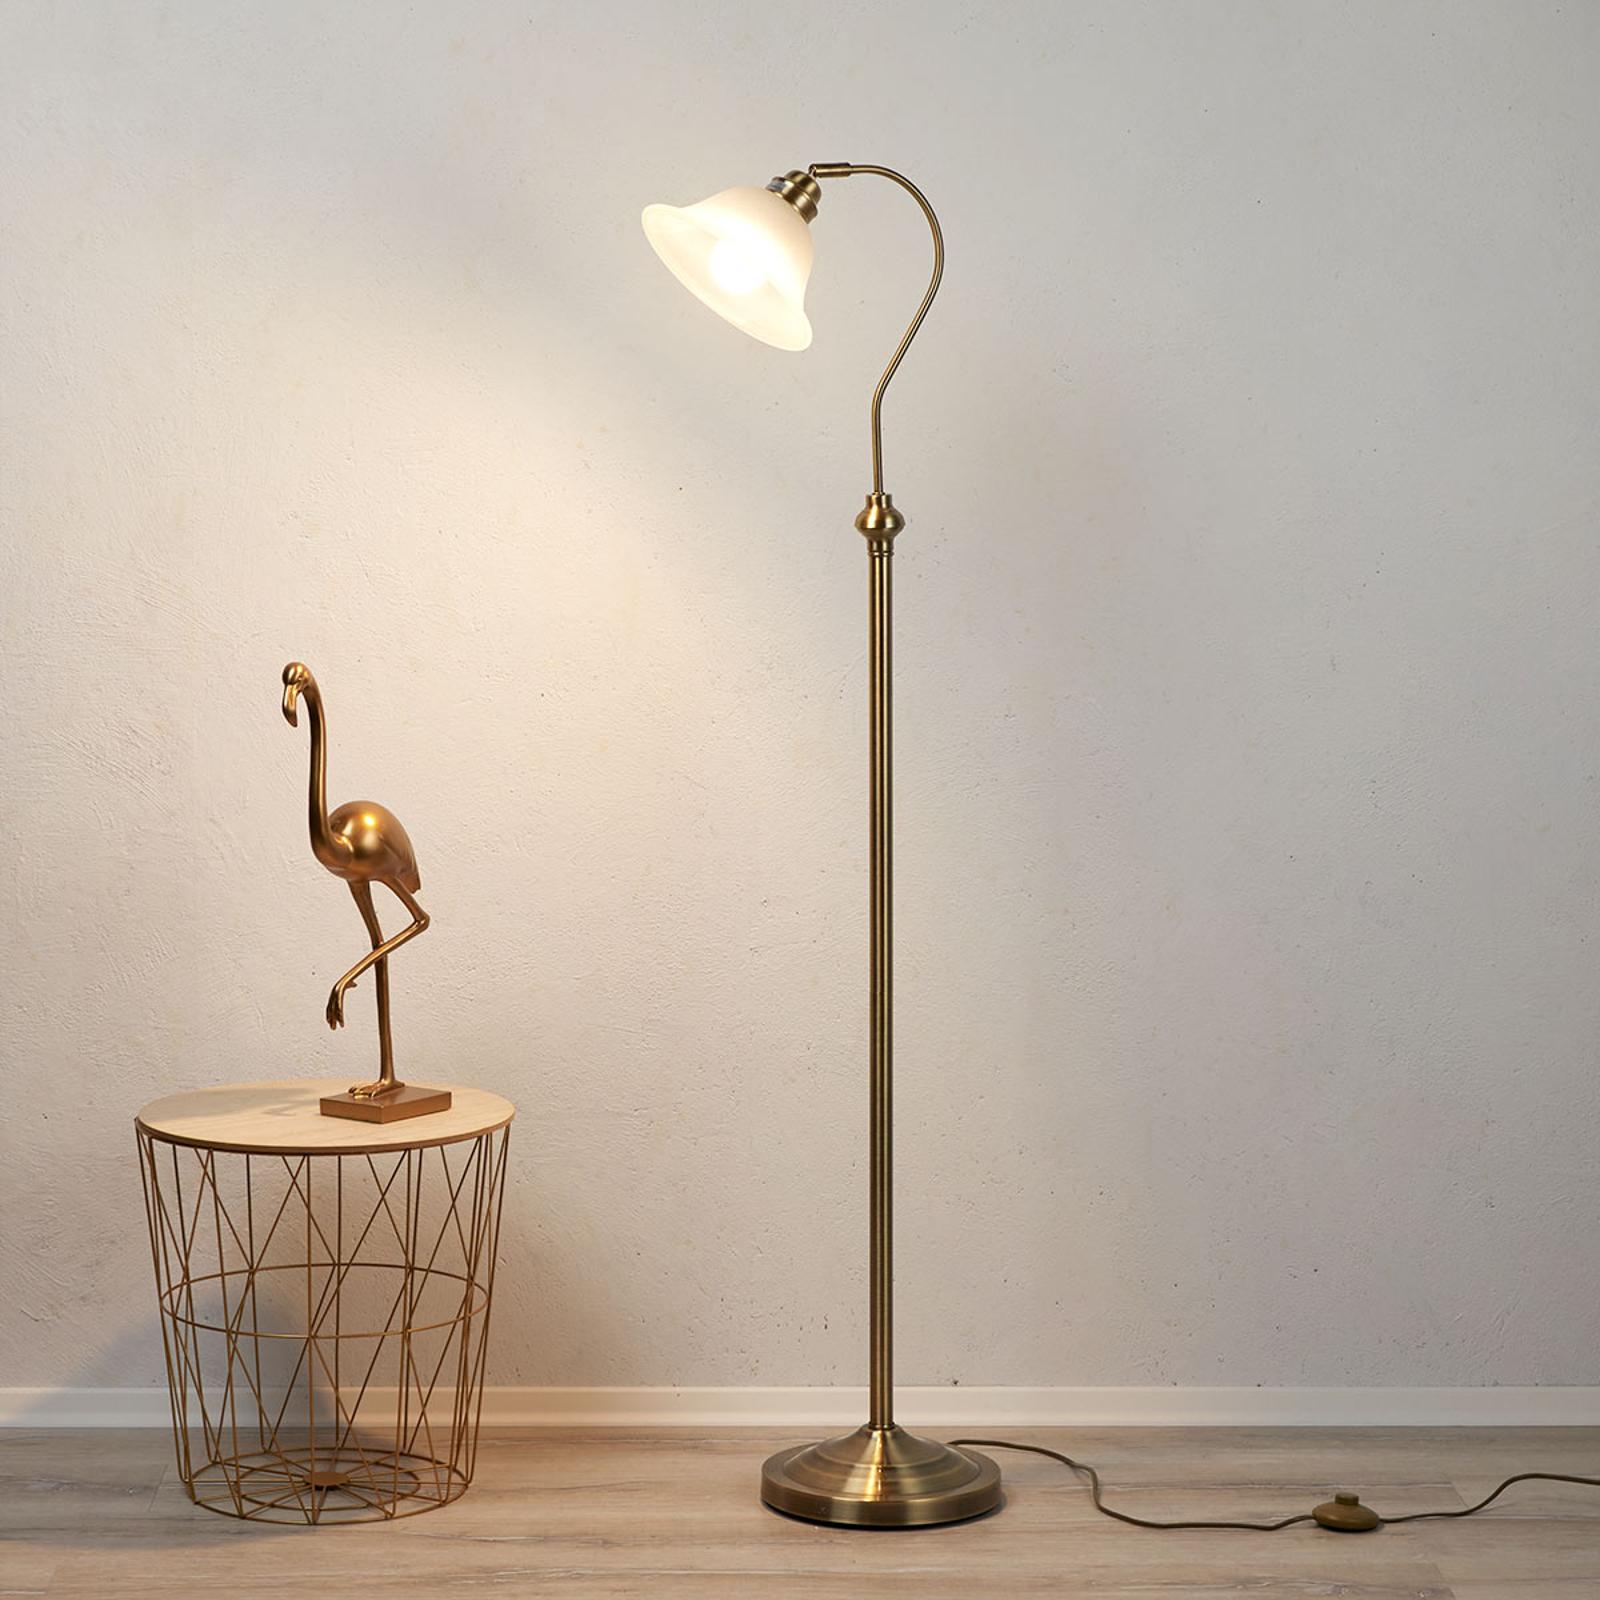 Incantevole lamp pavimento BJANE ottone antico